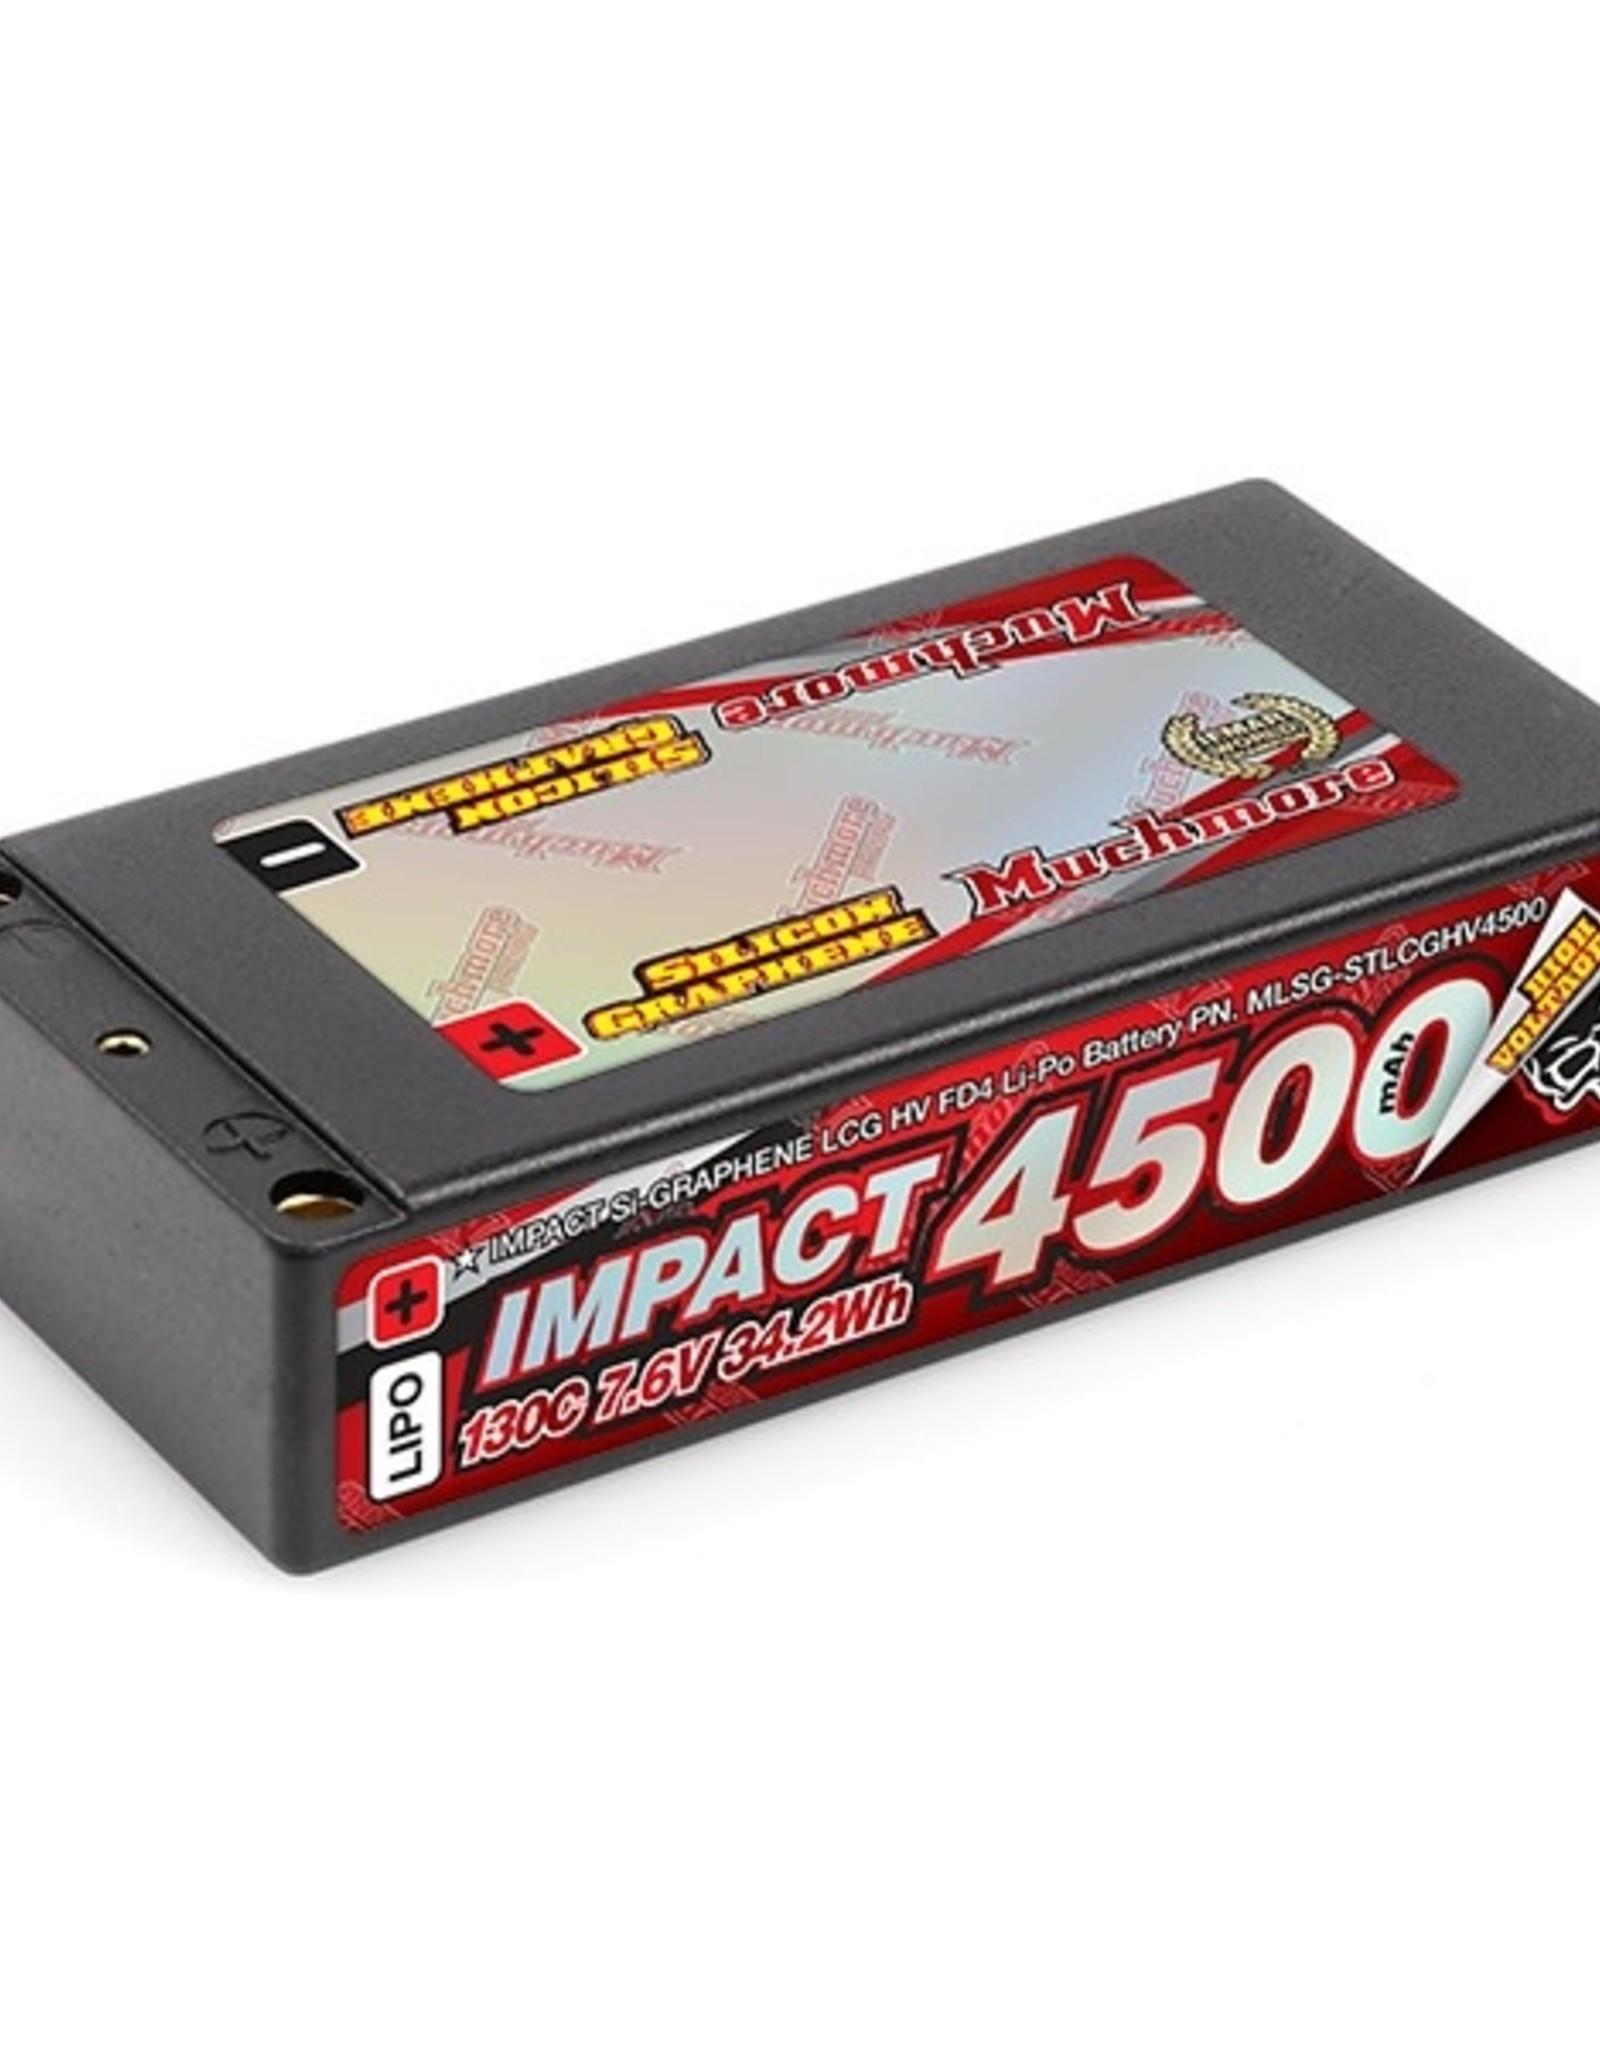 "Muchmore Muchmore IMPACT ""Silicon Graphene"" LCG HV FD4 4500mAh/7.6V 130C Shorty"